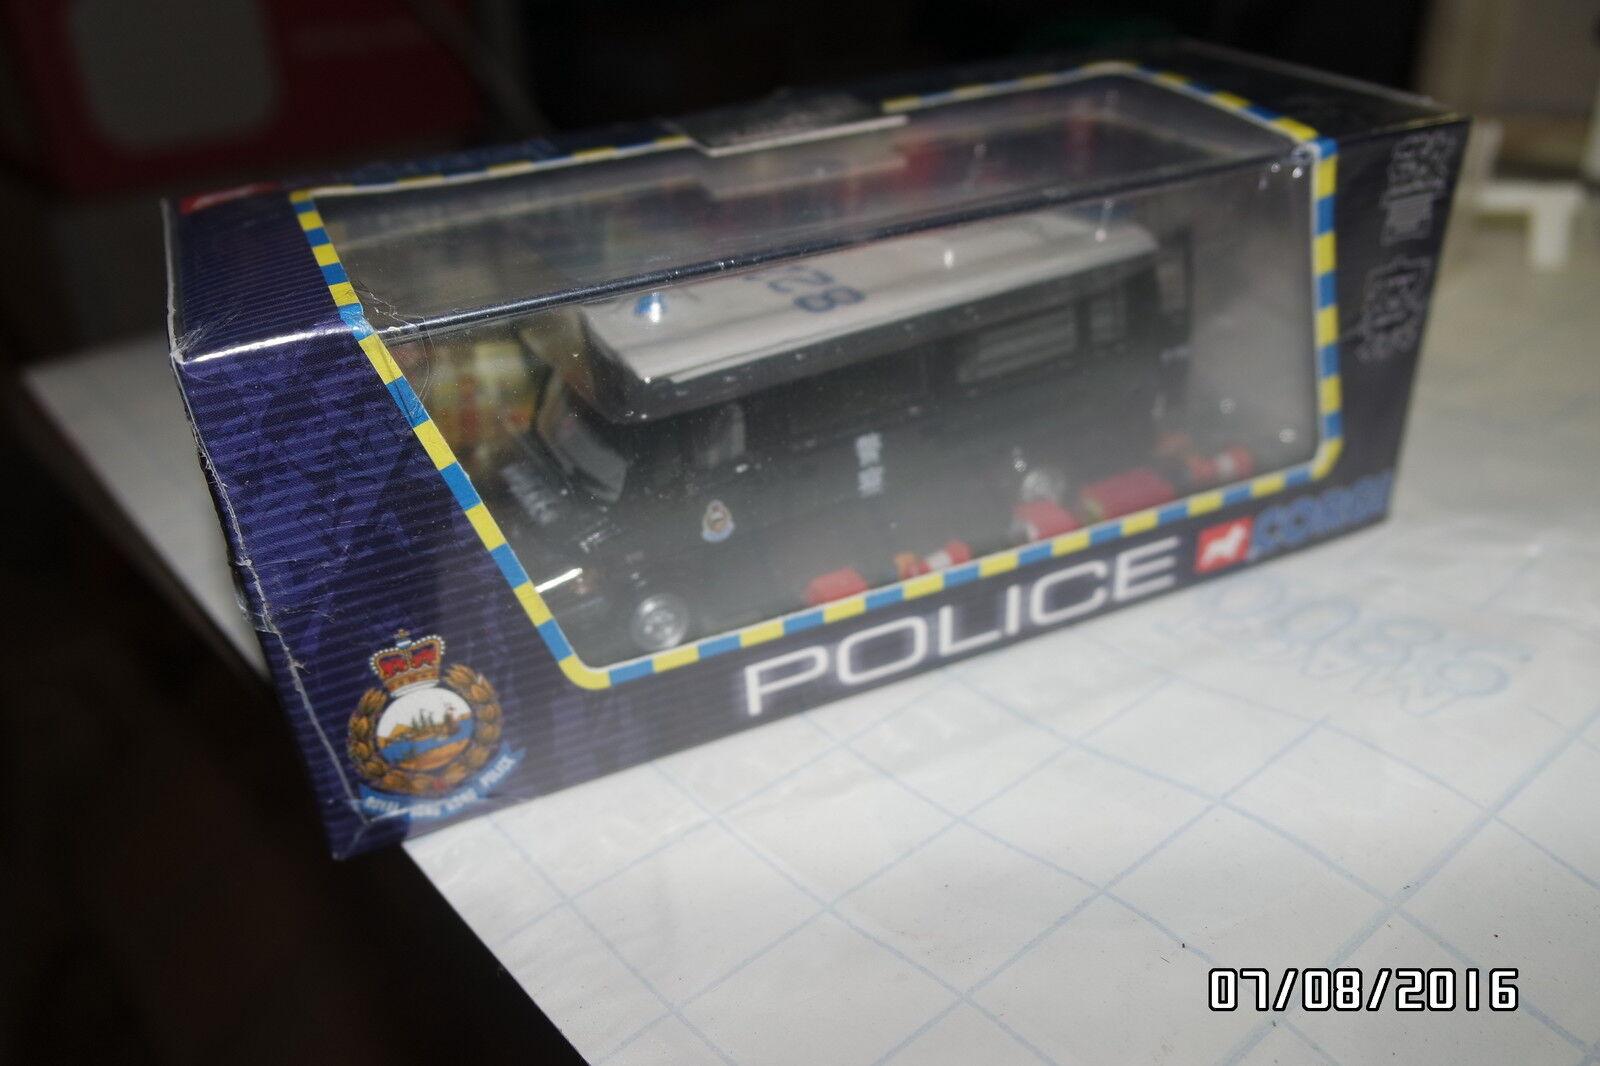 MERCEDES 310 FOURGON POLICE HONG HONG HONG KONG 3000 EX NB CC02202 aad56c